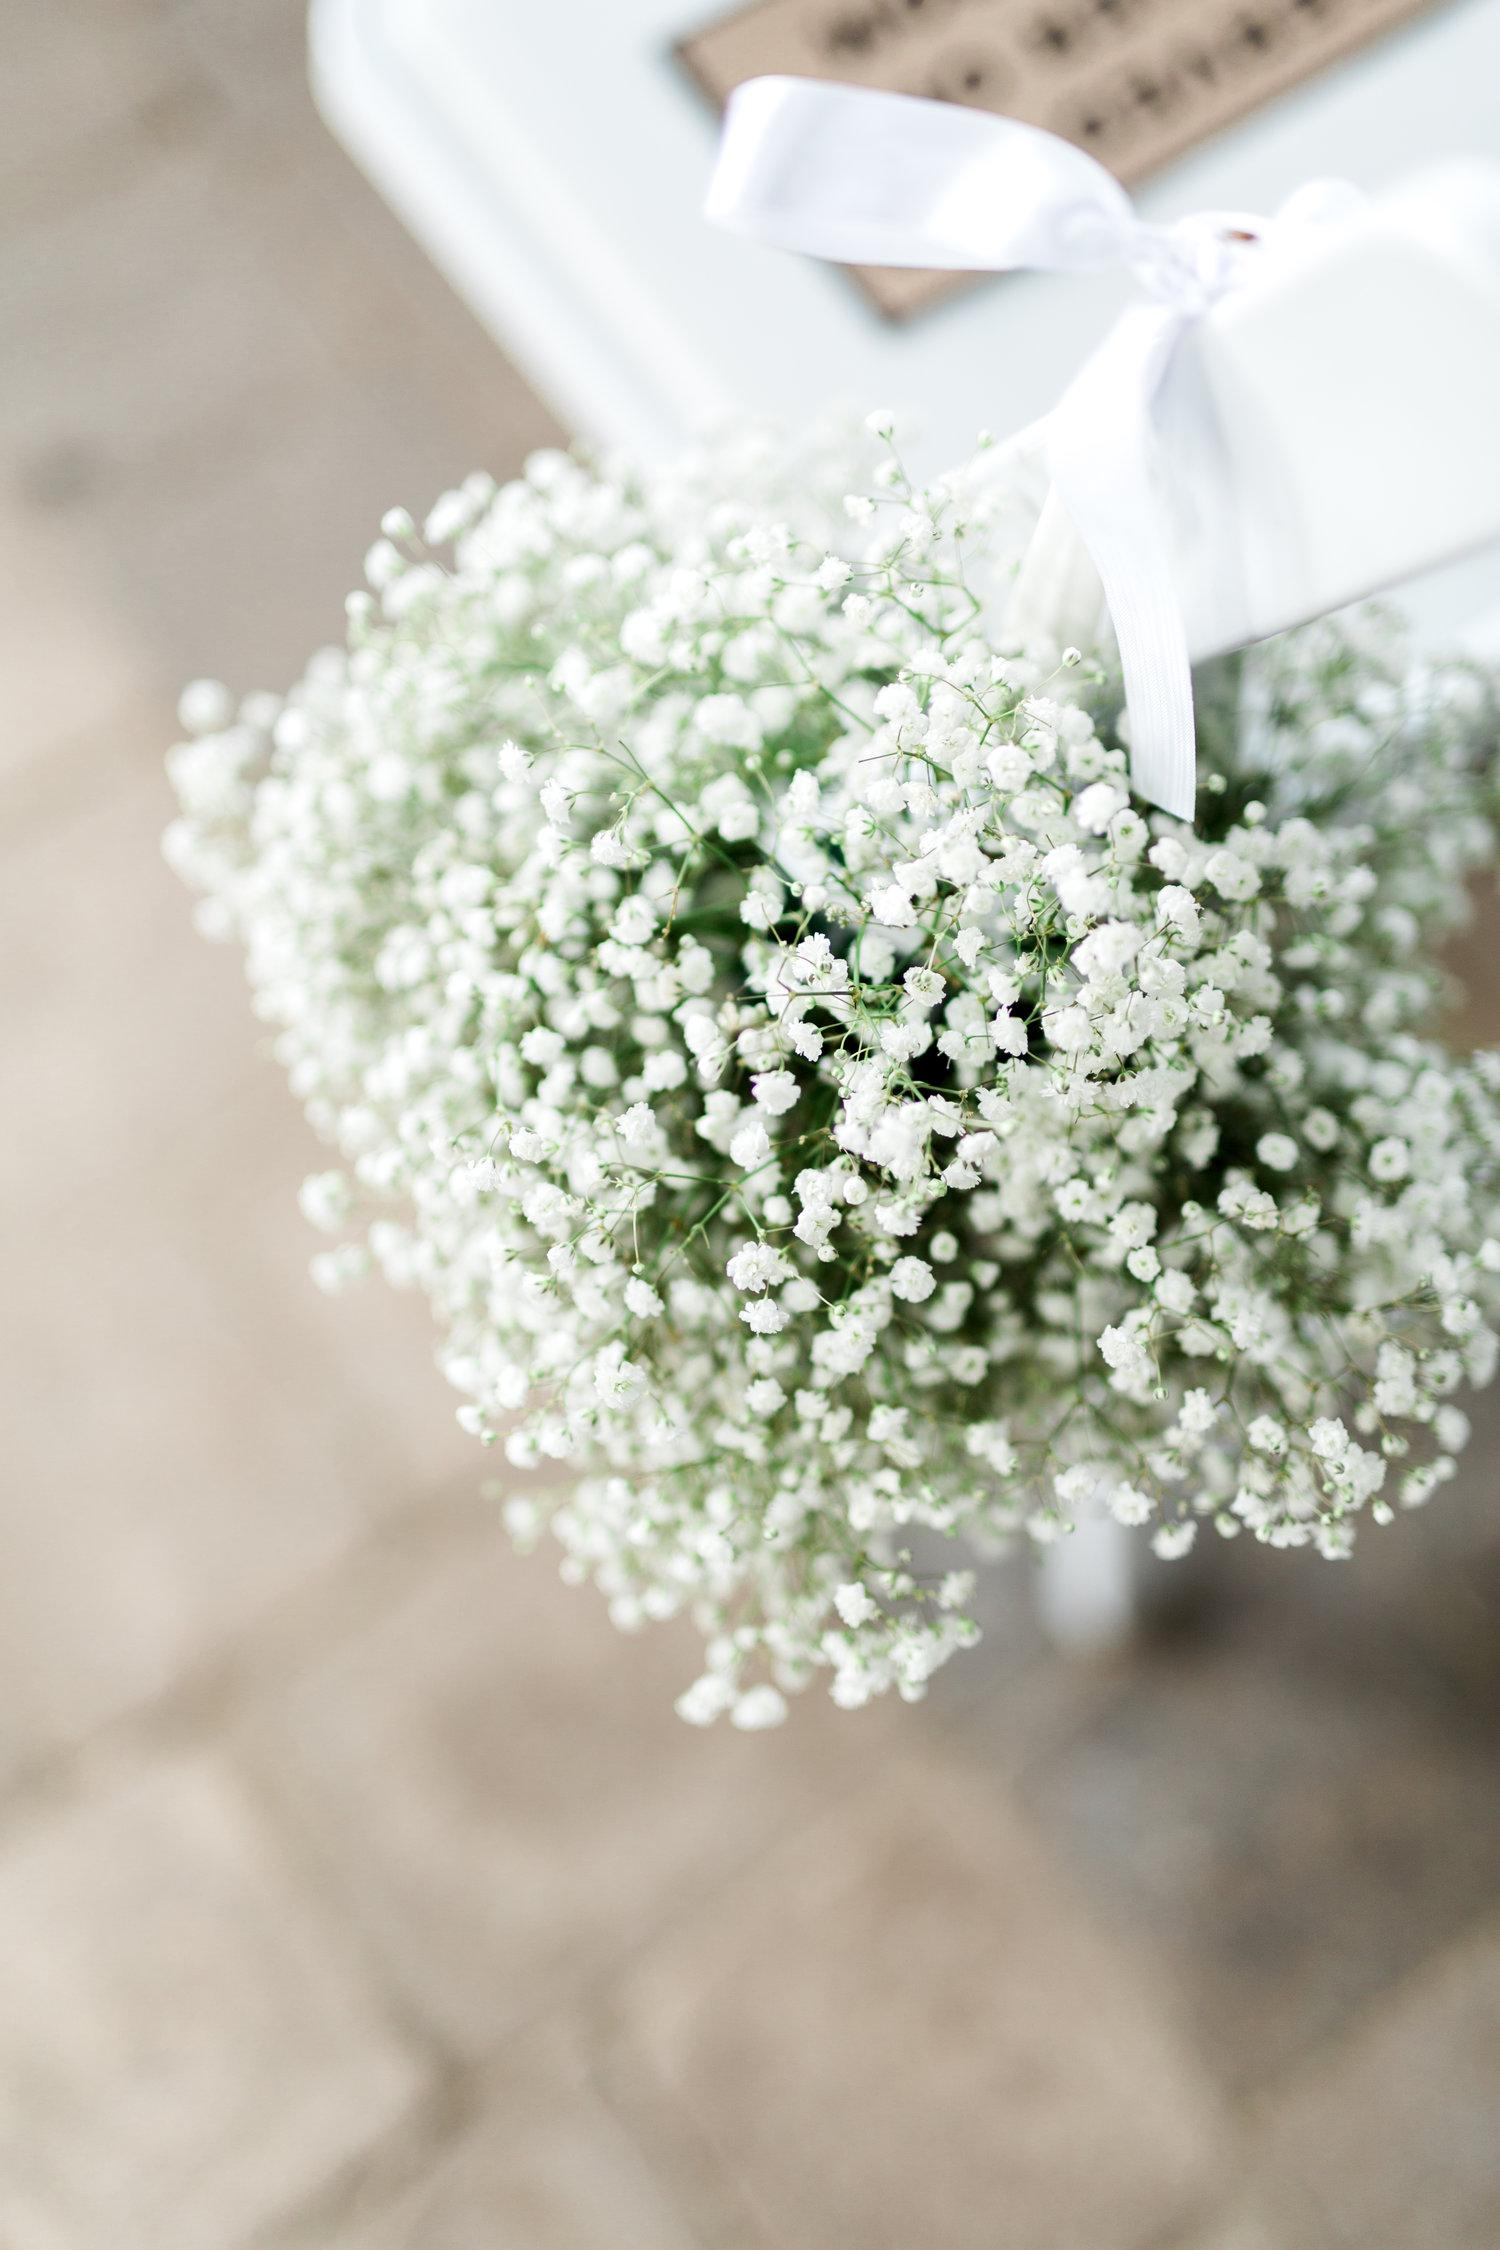 Amir-Golbazi-Danielle-Giroux-Photography_Toronto-Wedding_Cedarwood_Rachel-Paul_139.jpg